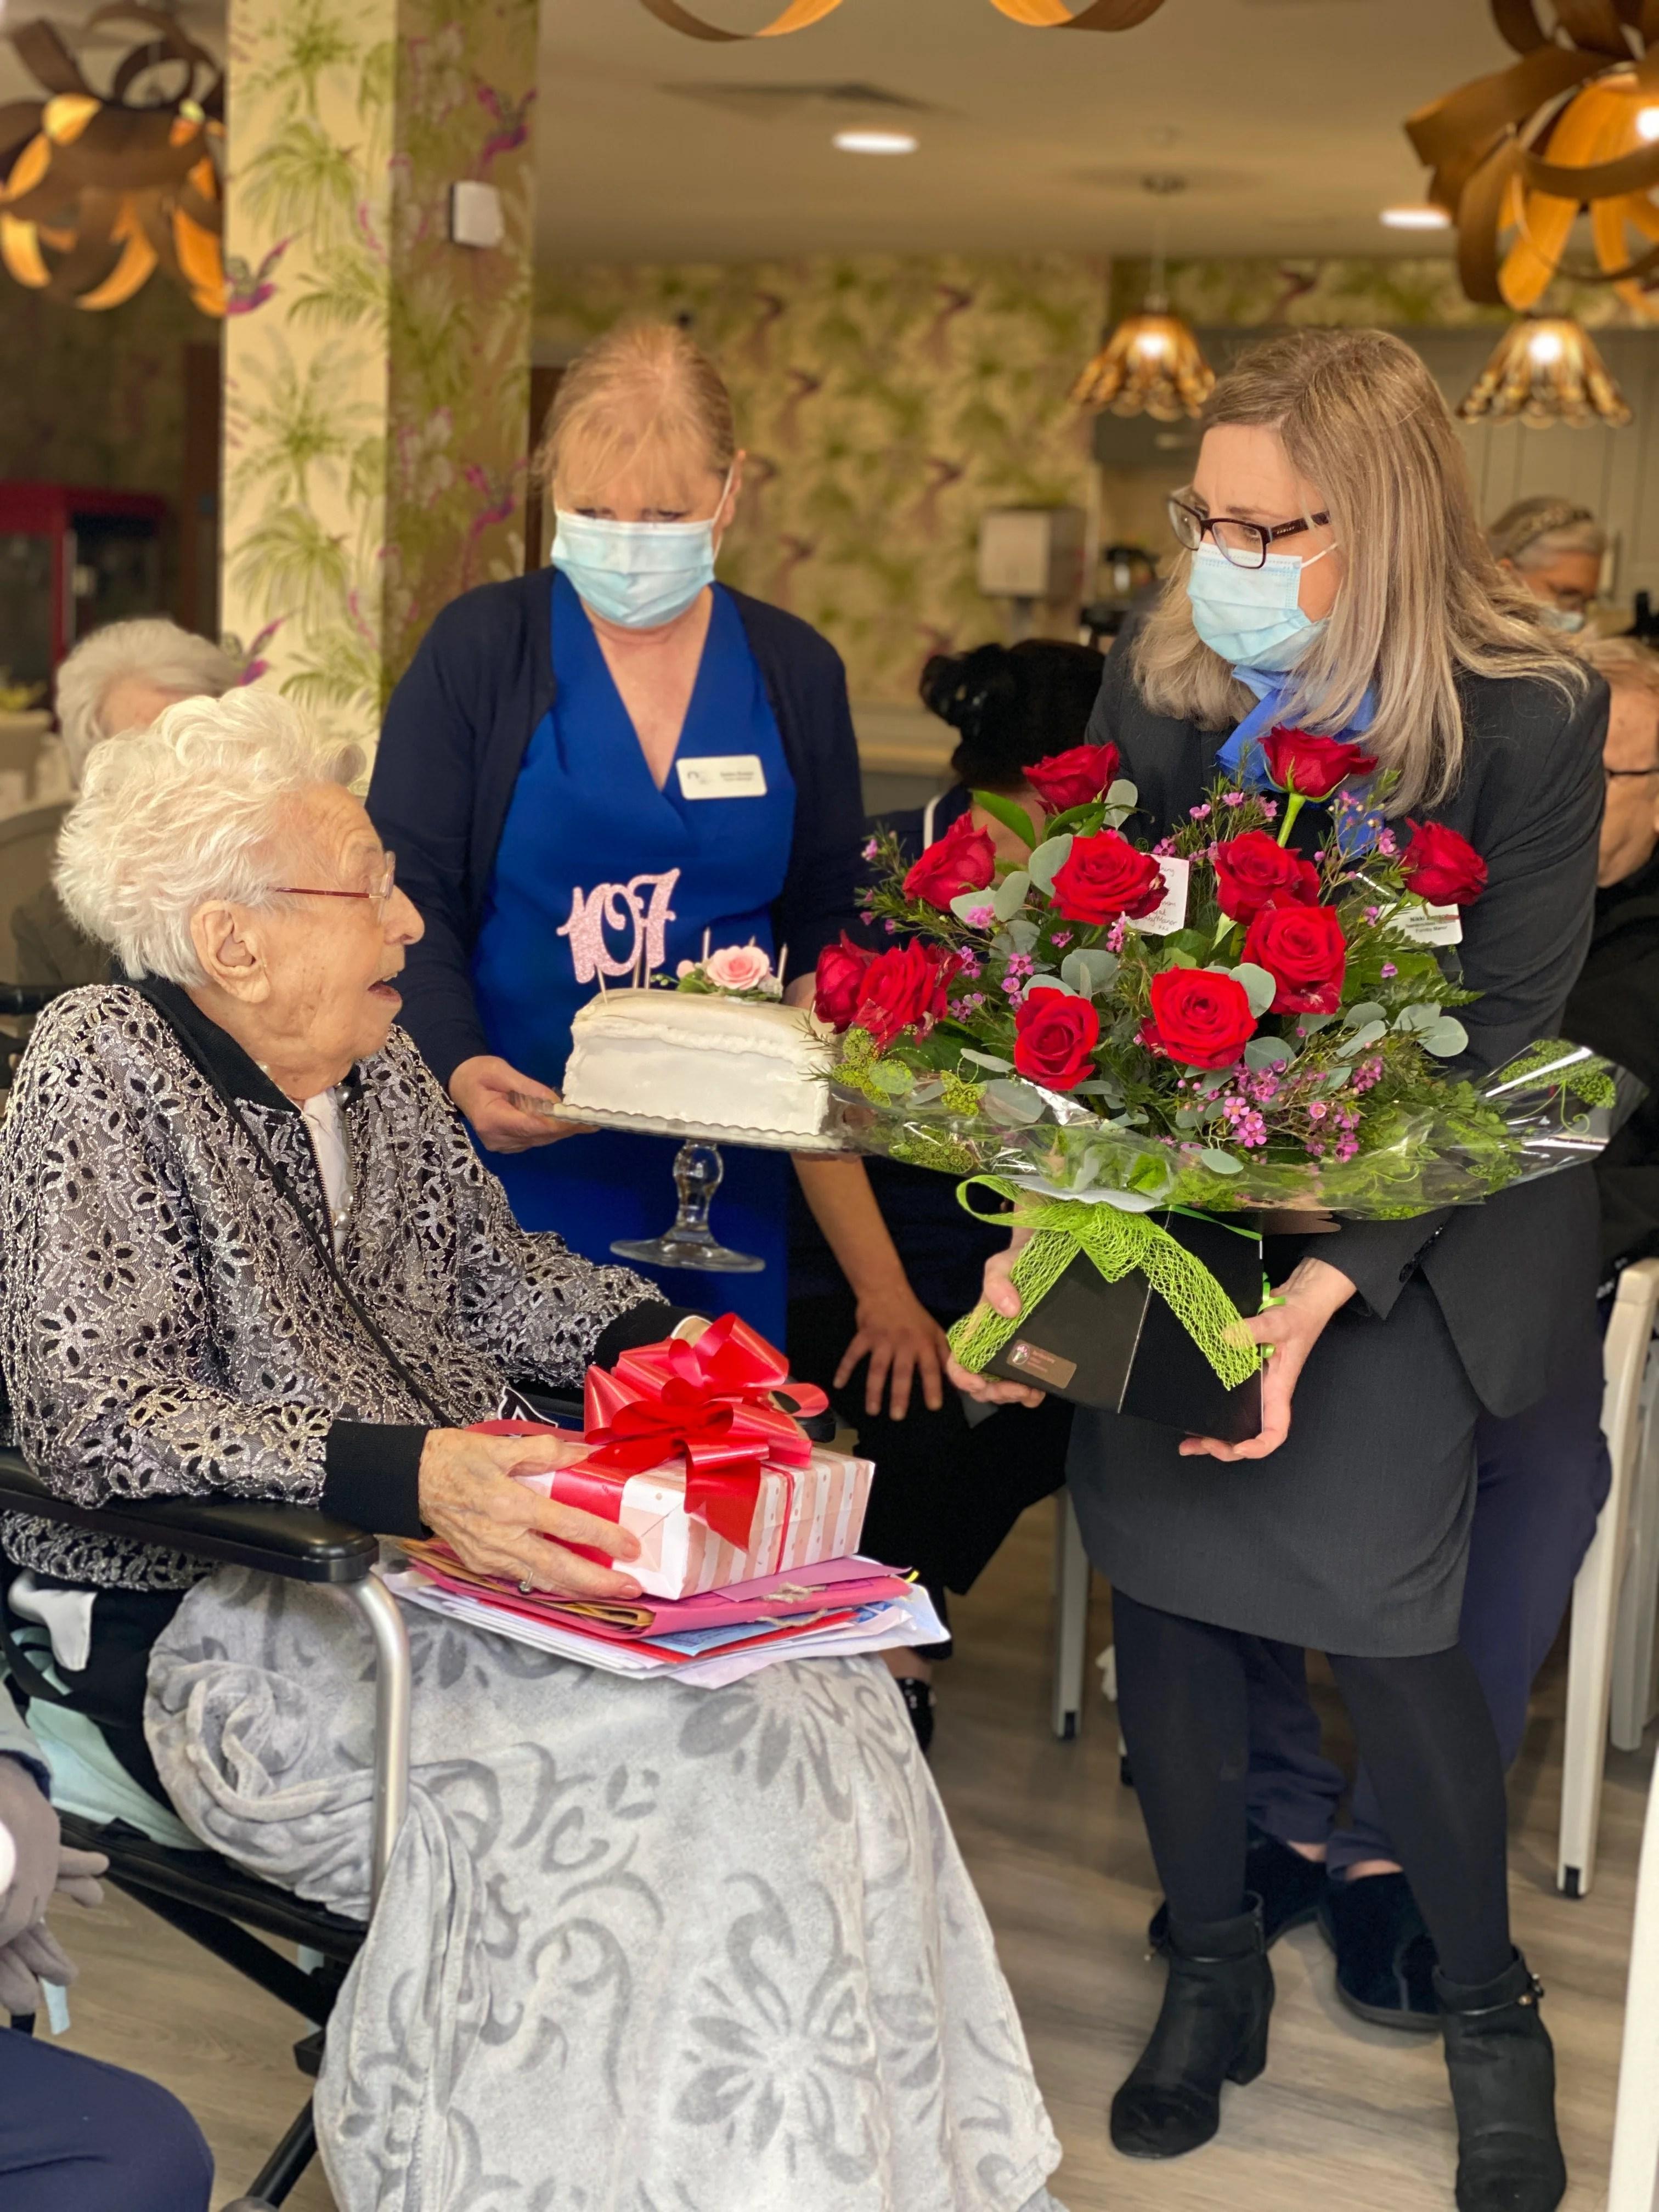 Merseyside woman pens poem to mark 107th birthday